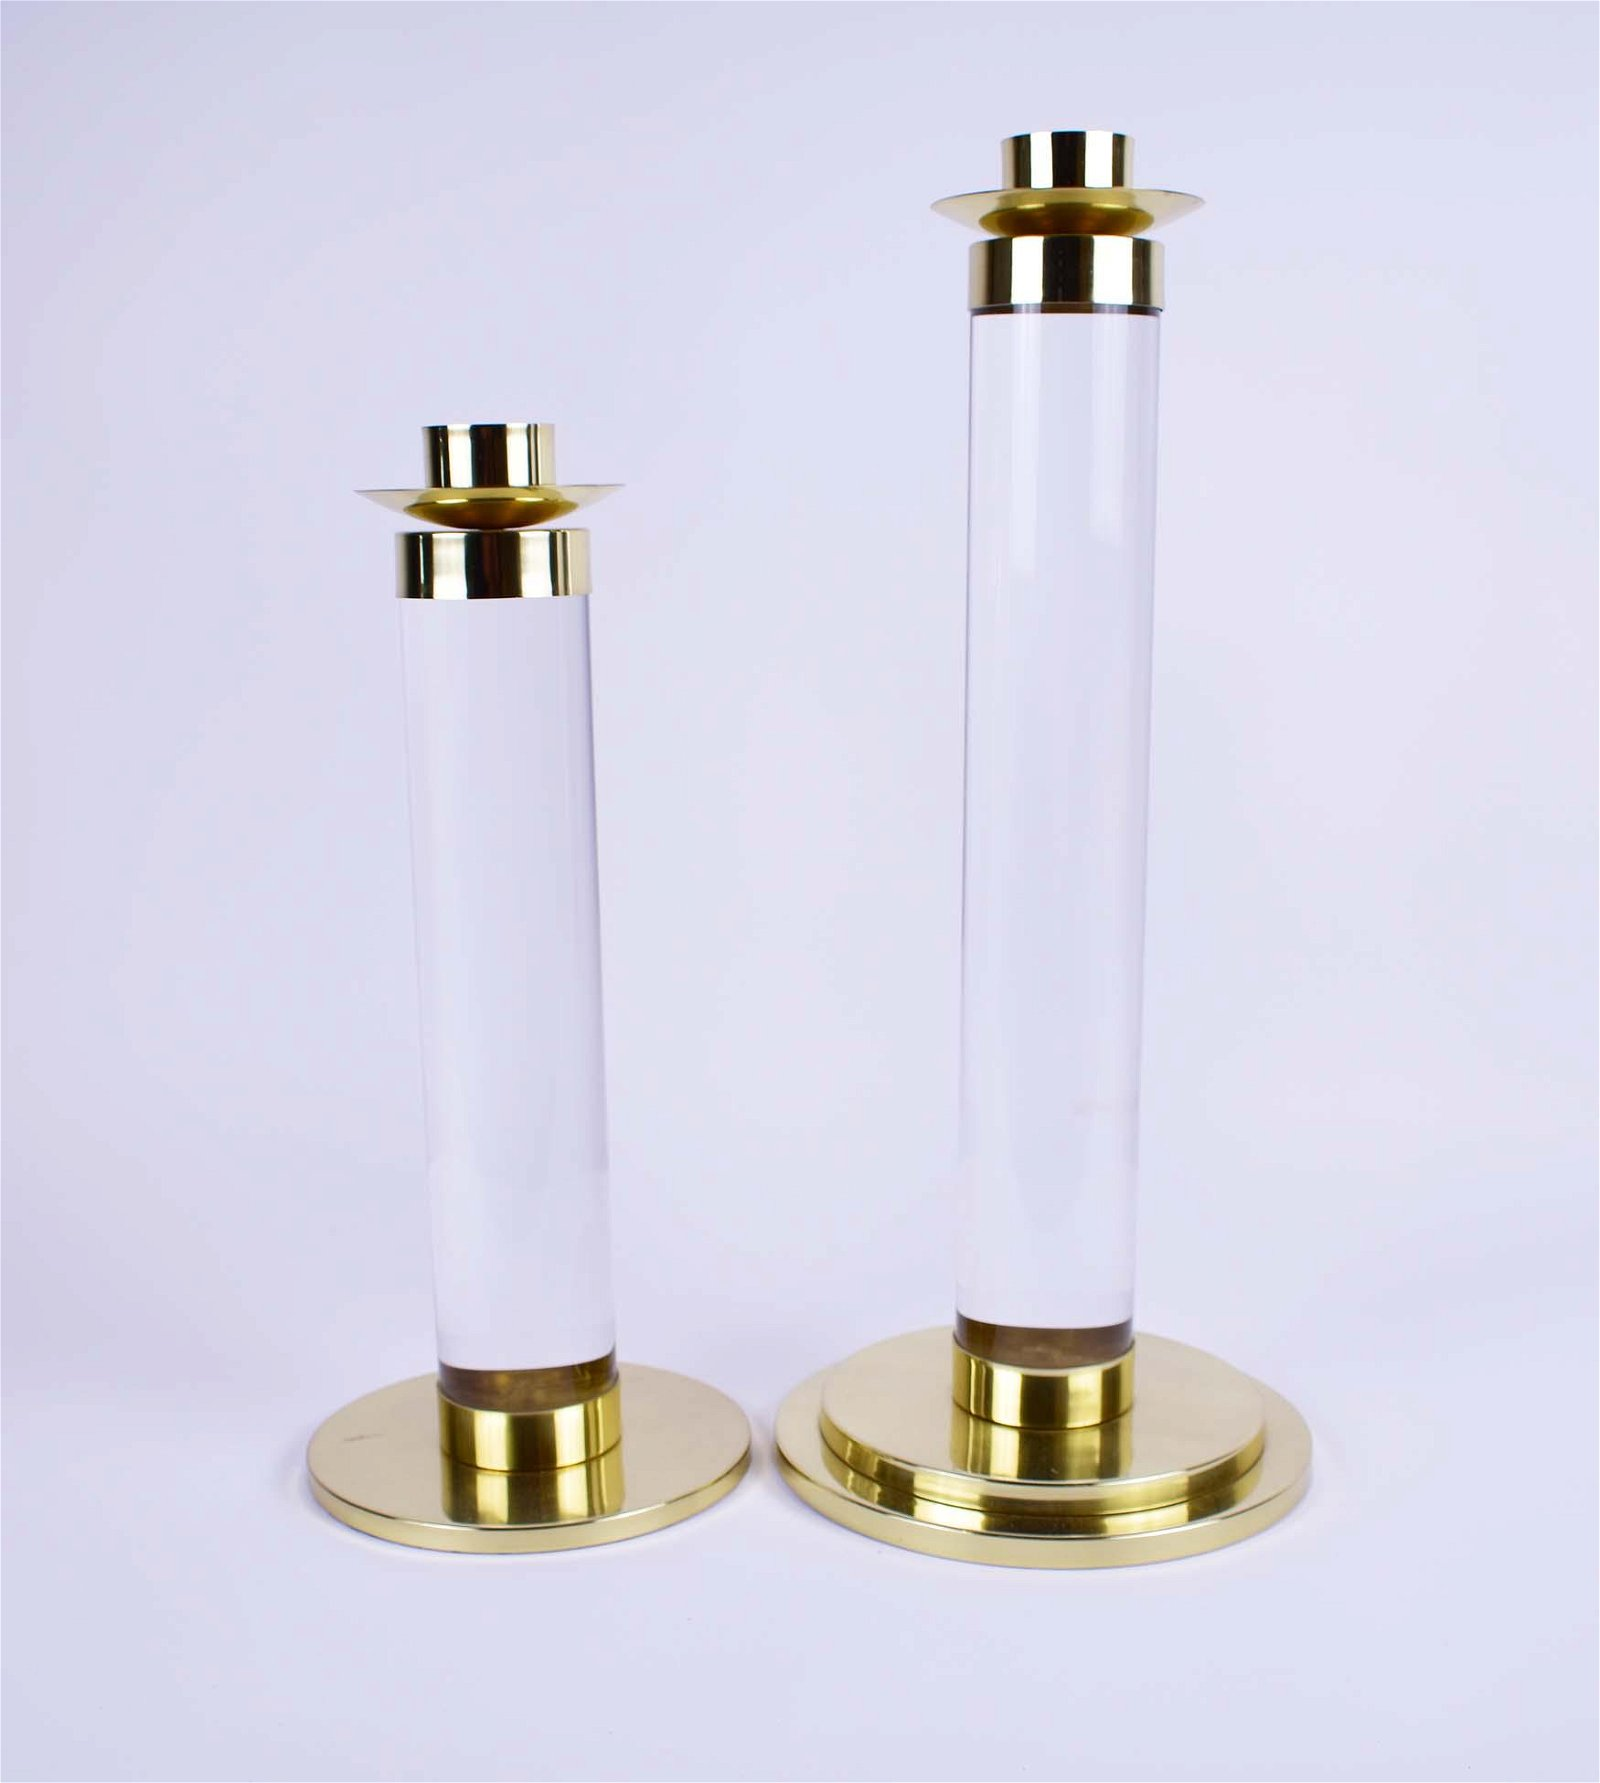 TWO CONTEMPORARY BRASS & GLASS COLUMNAR CANDLESTICKS